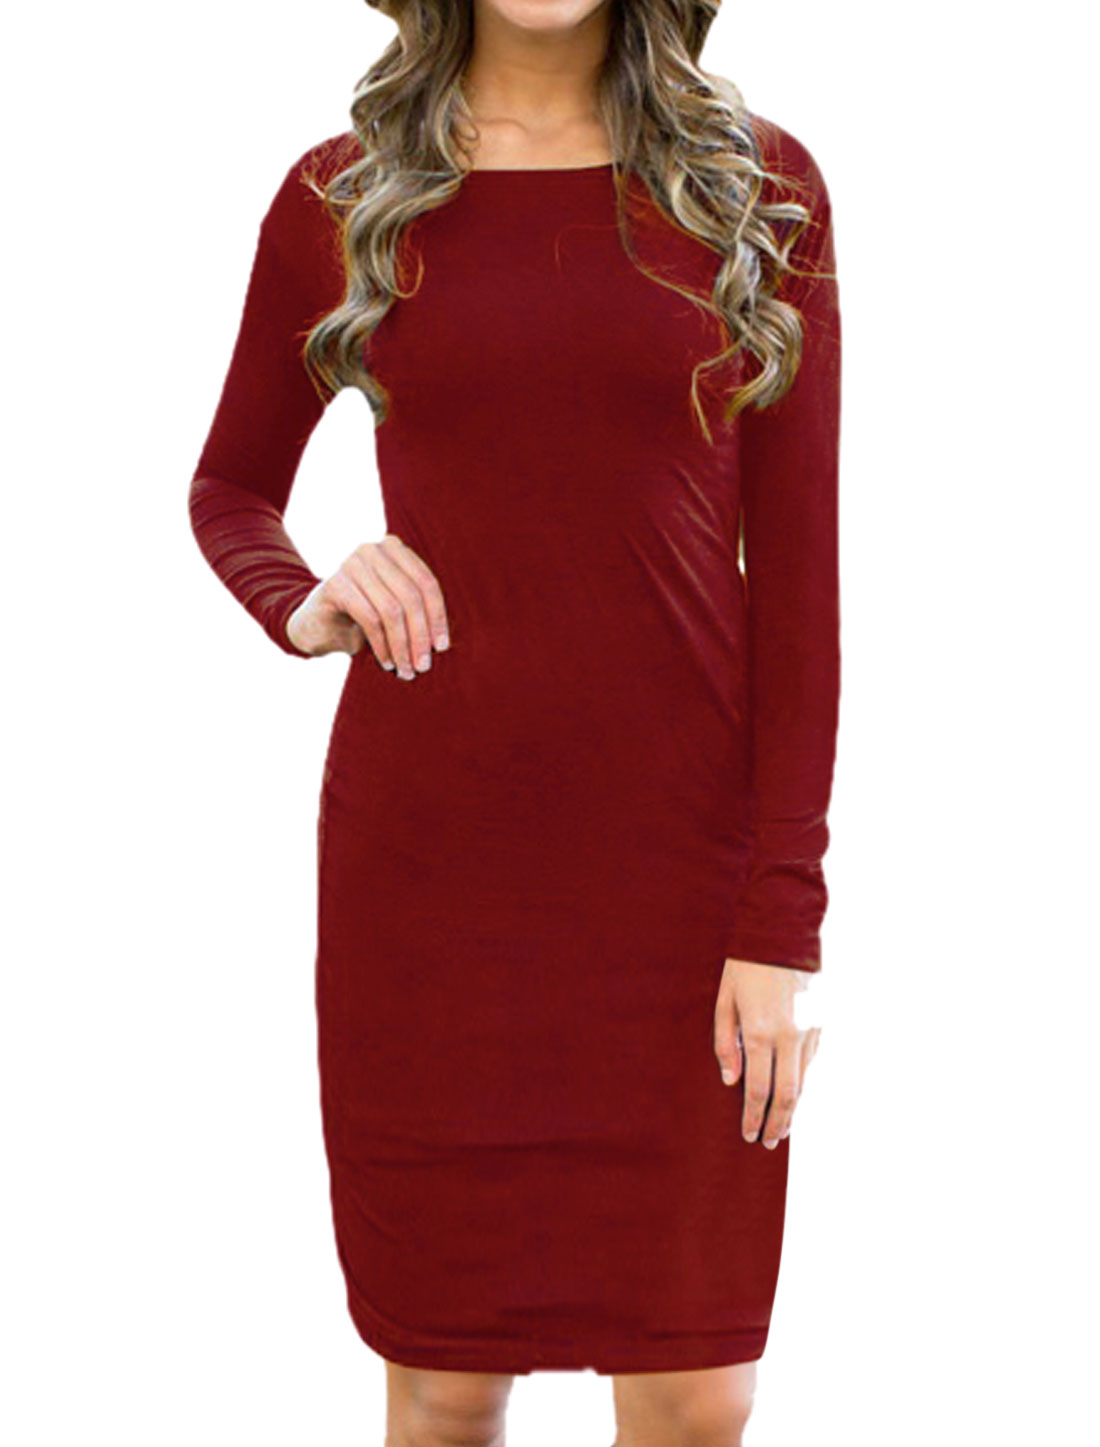 Ladies Drop Shoulder Round Neck Mini Pencil Dress Red M